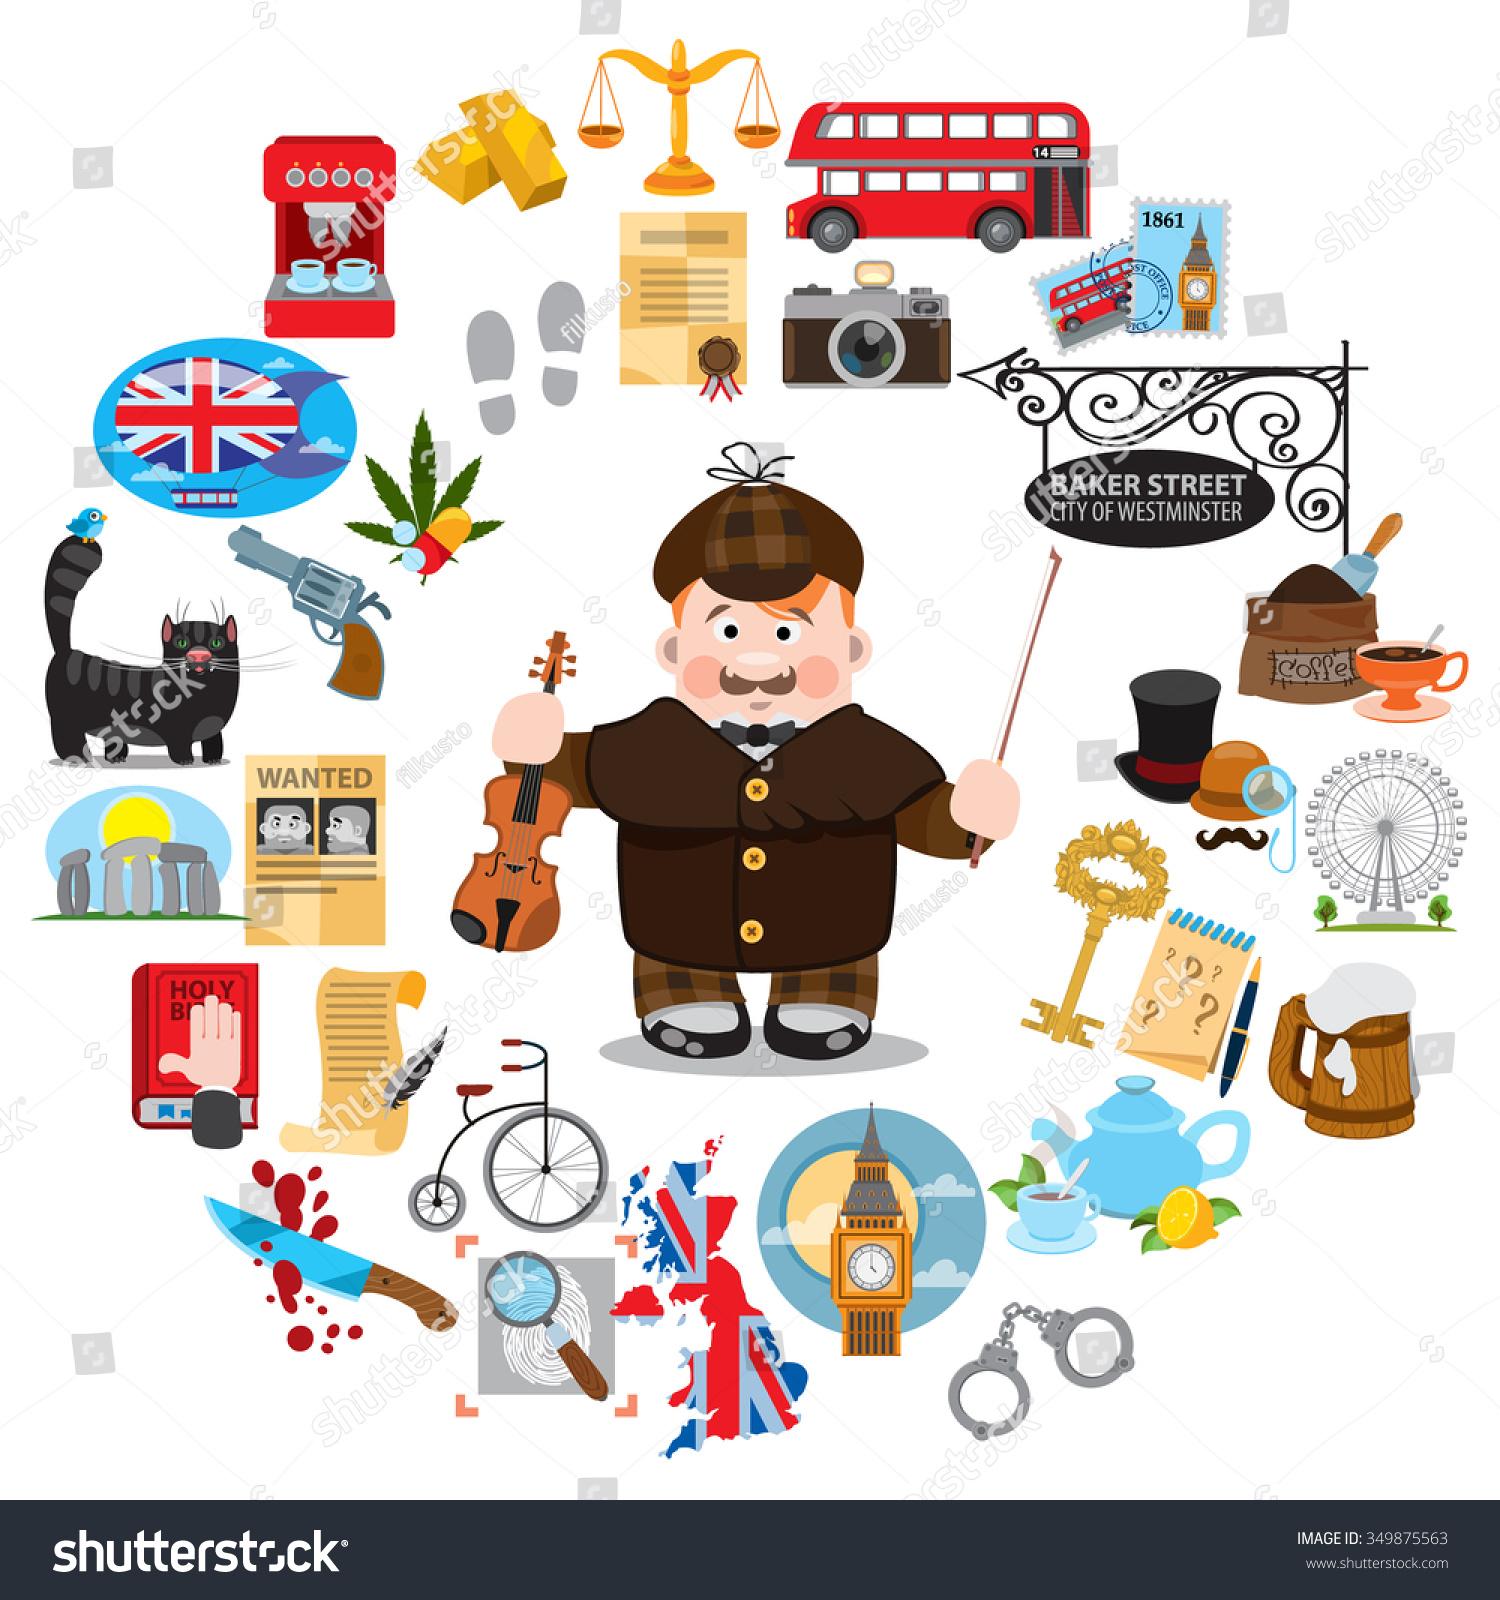 Sherlock Holmes England Icons Detective Stock Vector 349875563 ...